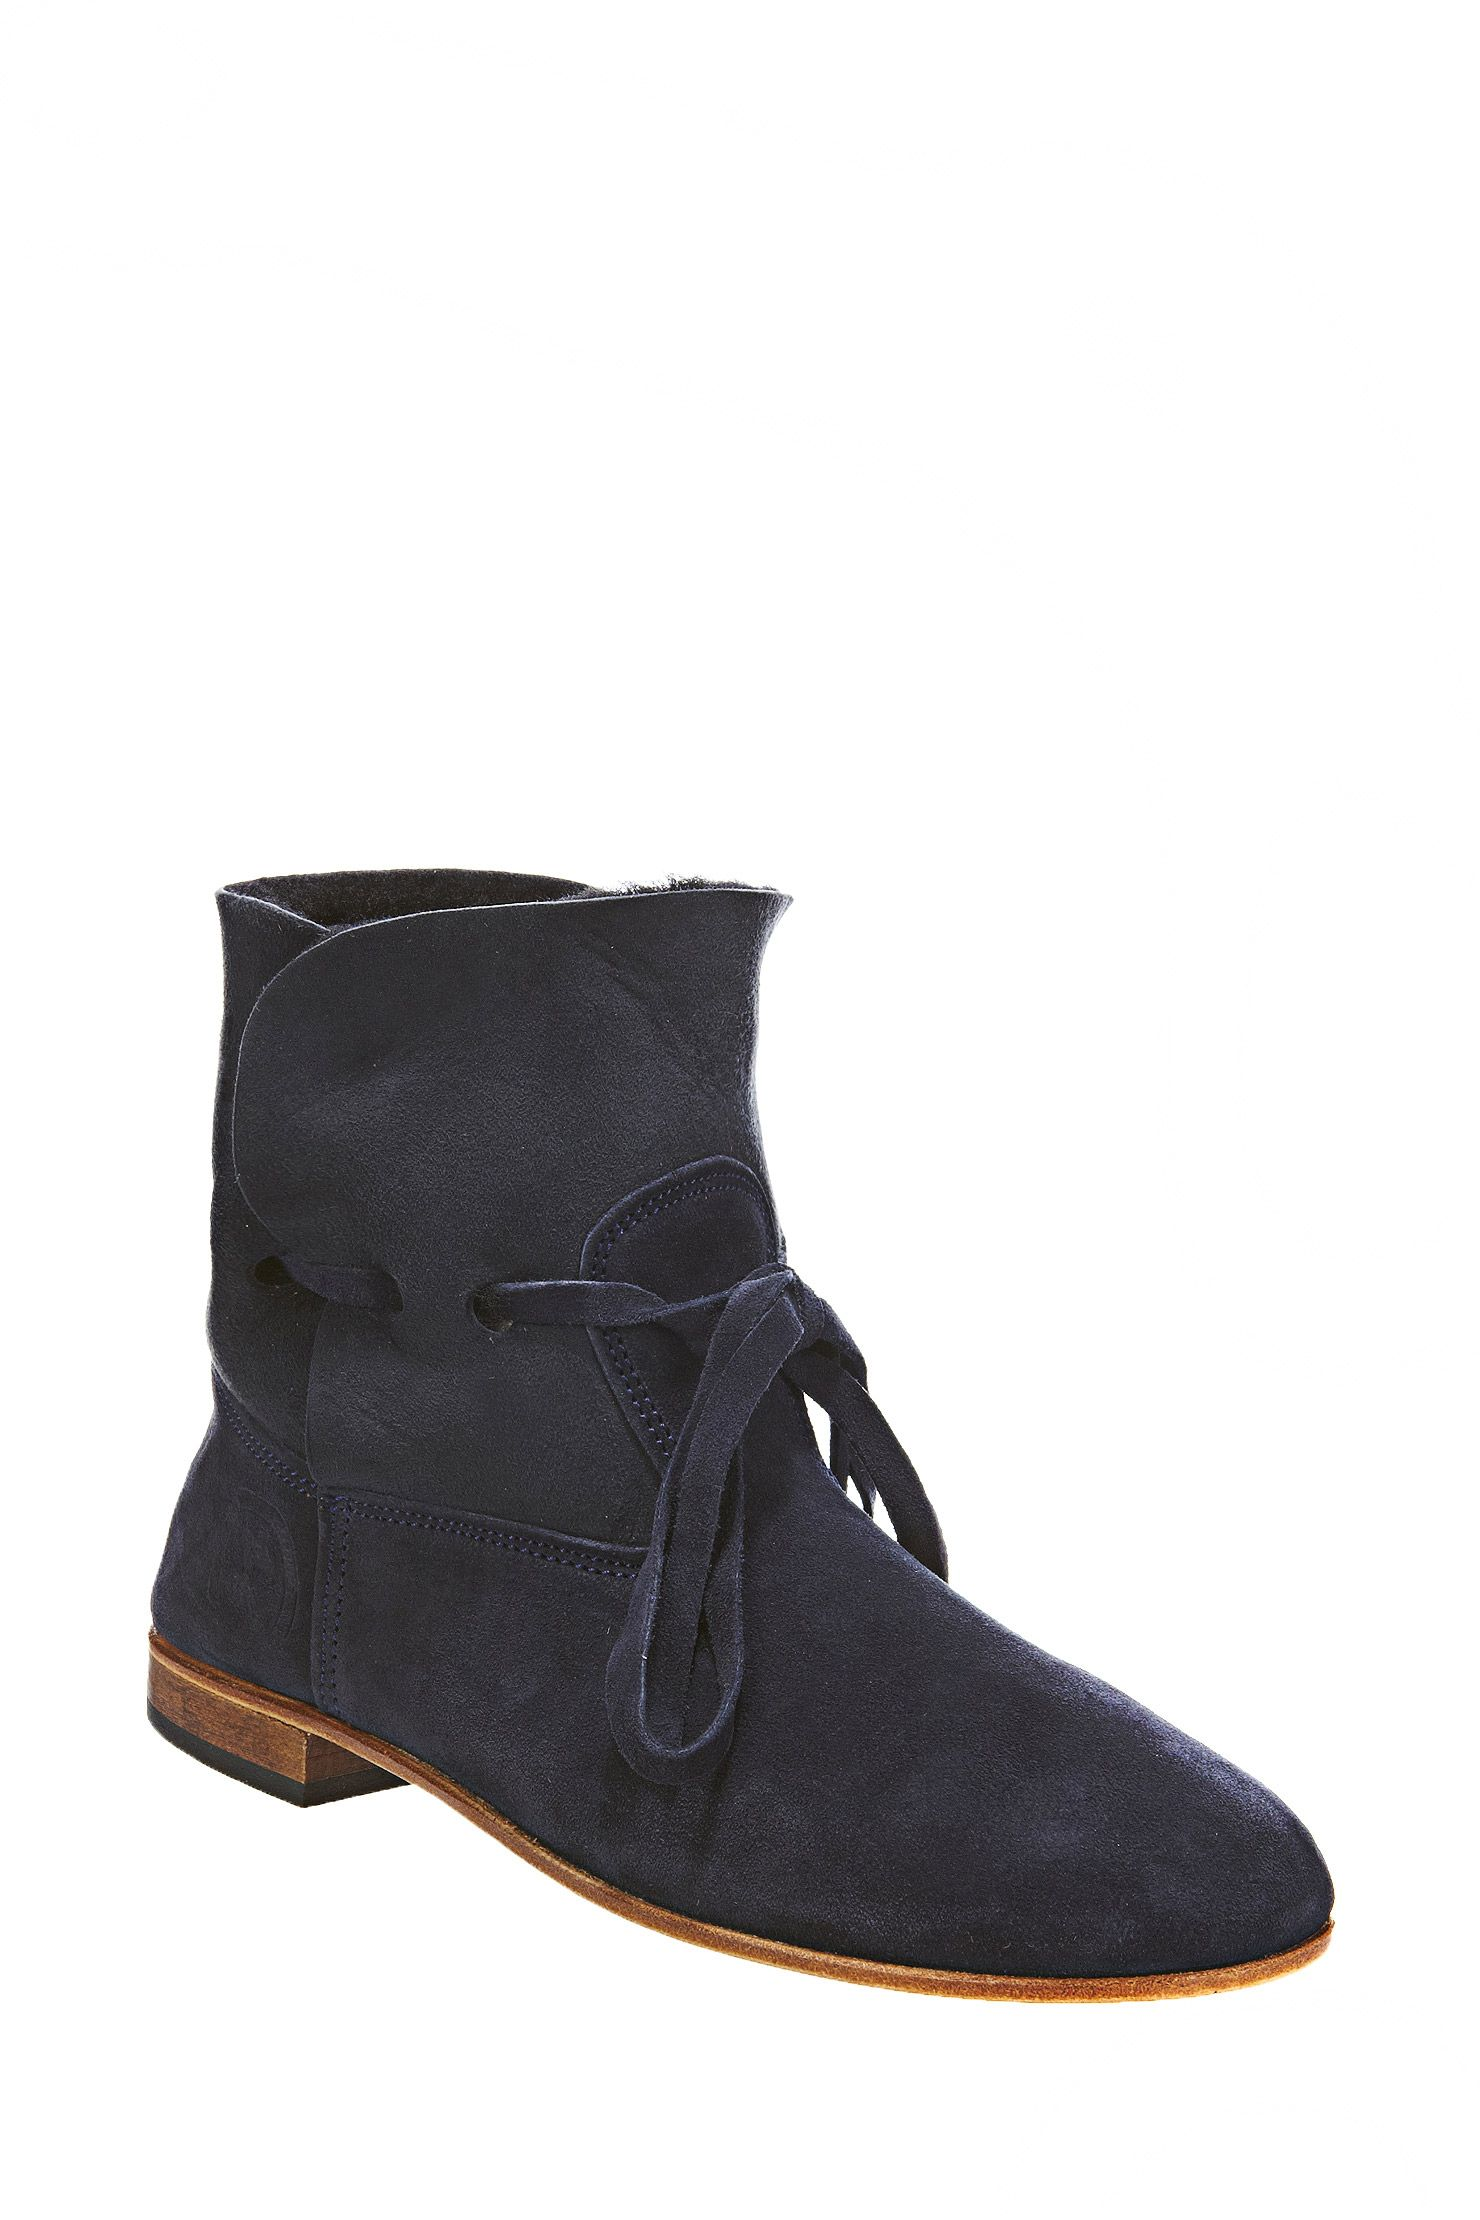 botas - cheyenne velours - azul / marina de guerra la botte